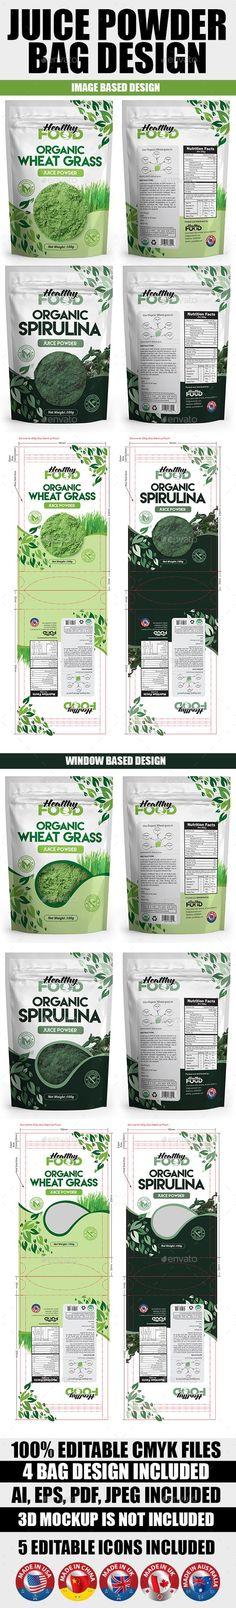 Juice Powder Bag Design Template - Packaging Print Templates